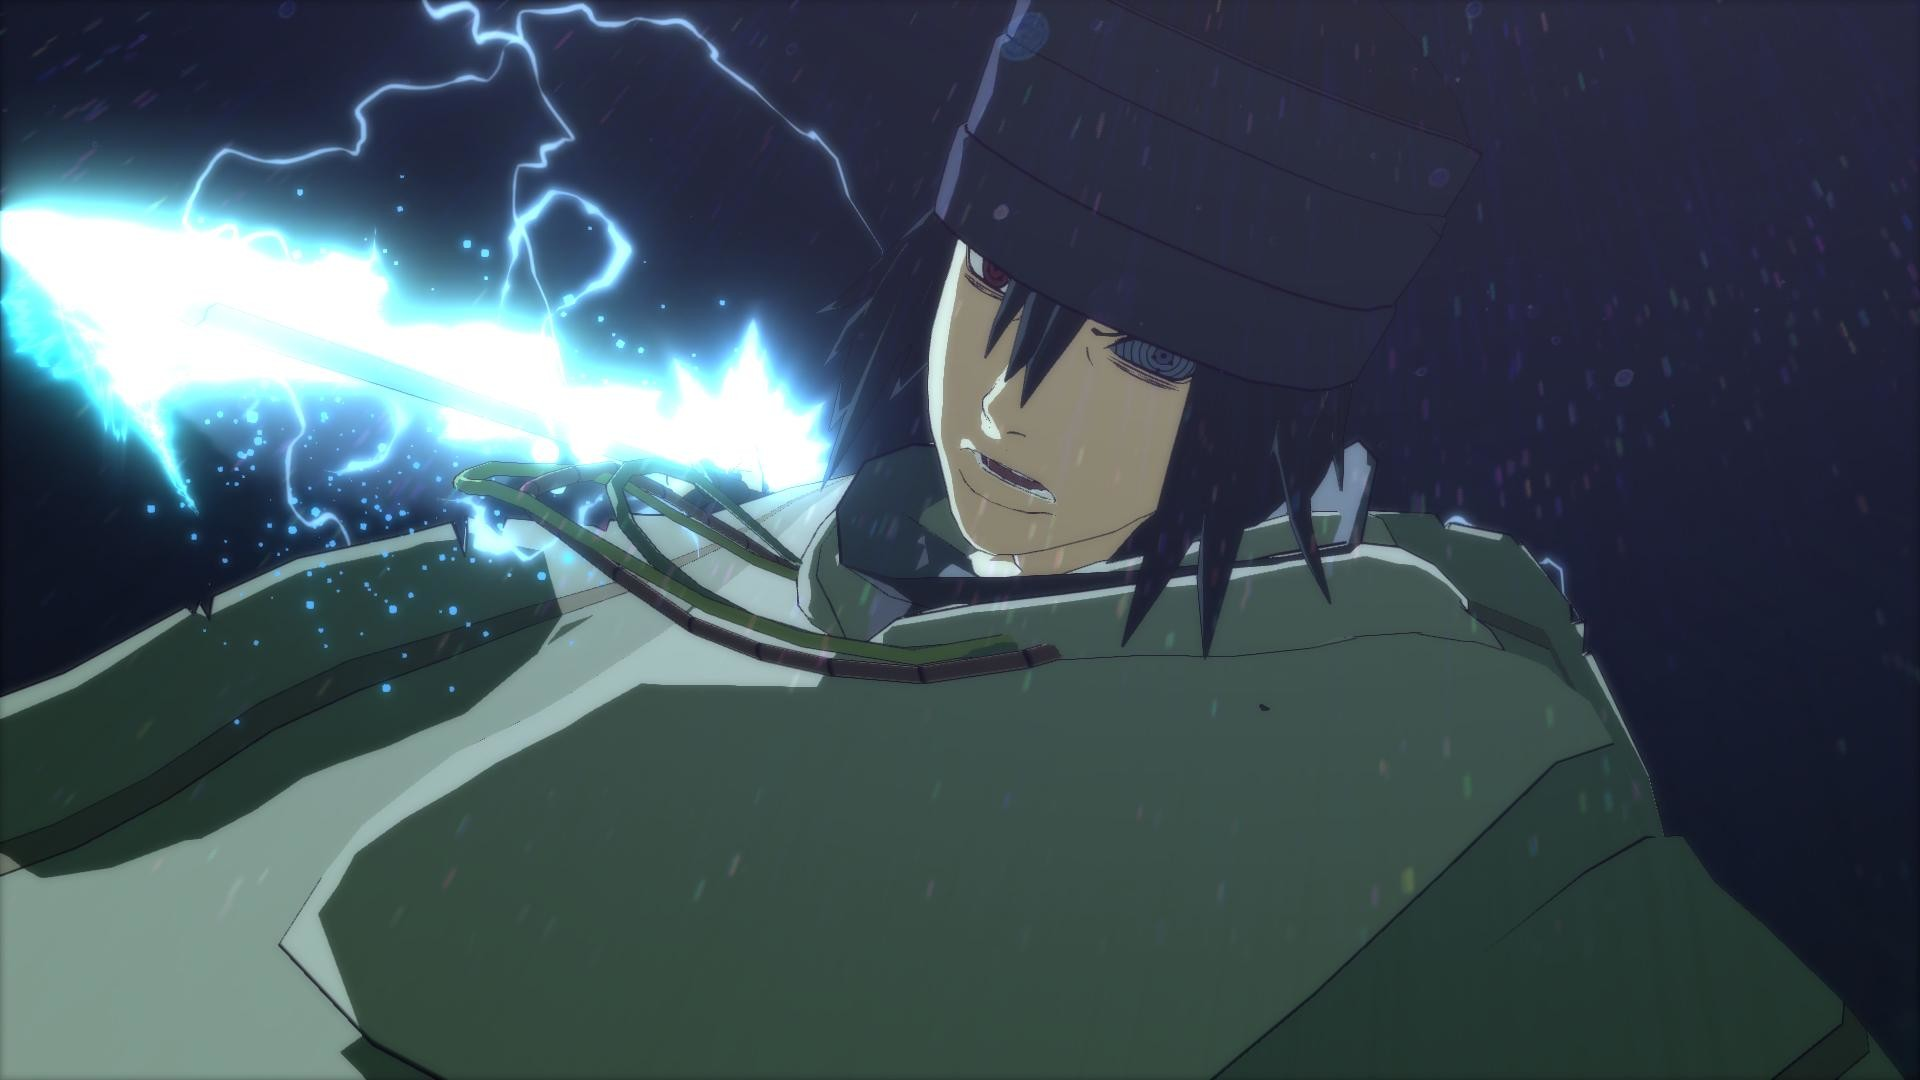 Res: 1920x1080, Naruto Shippuden: Ultimate Ninja Storm 4 HD Full HD Wallpaper